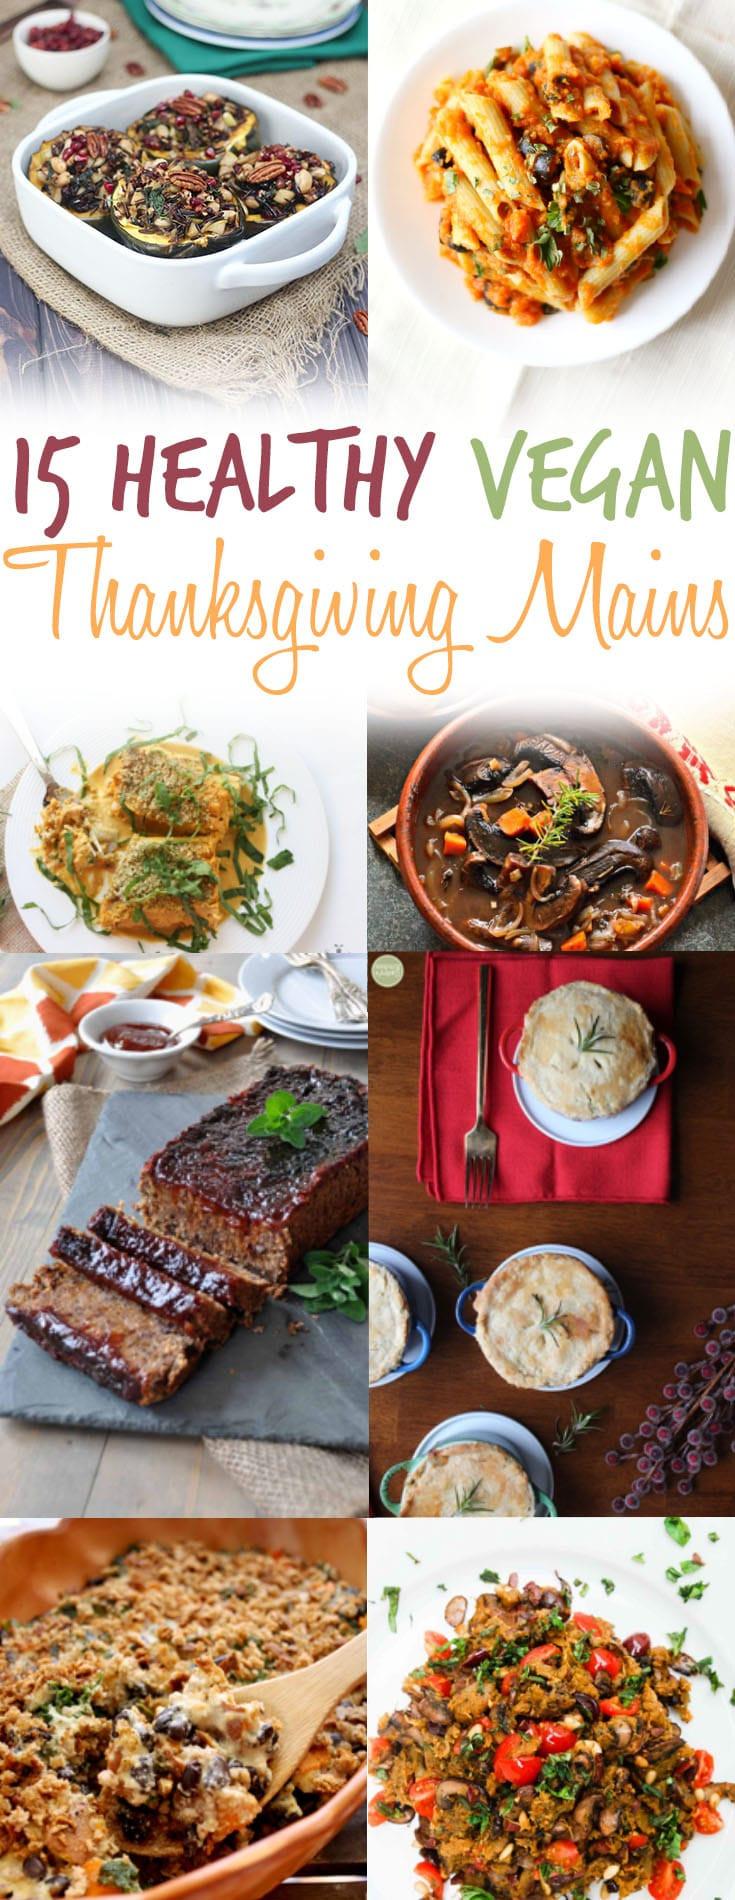 Thanksgiving Main Dishes  15 Vegan Thanksgiving Main Dishes